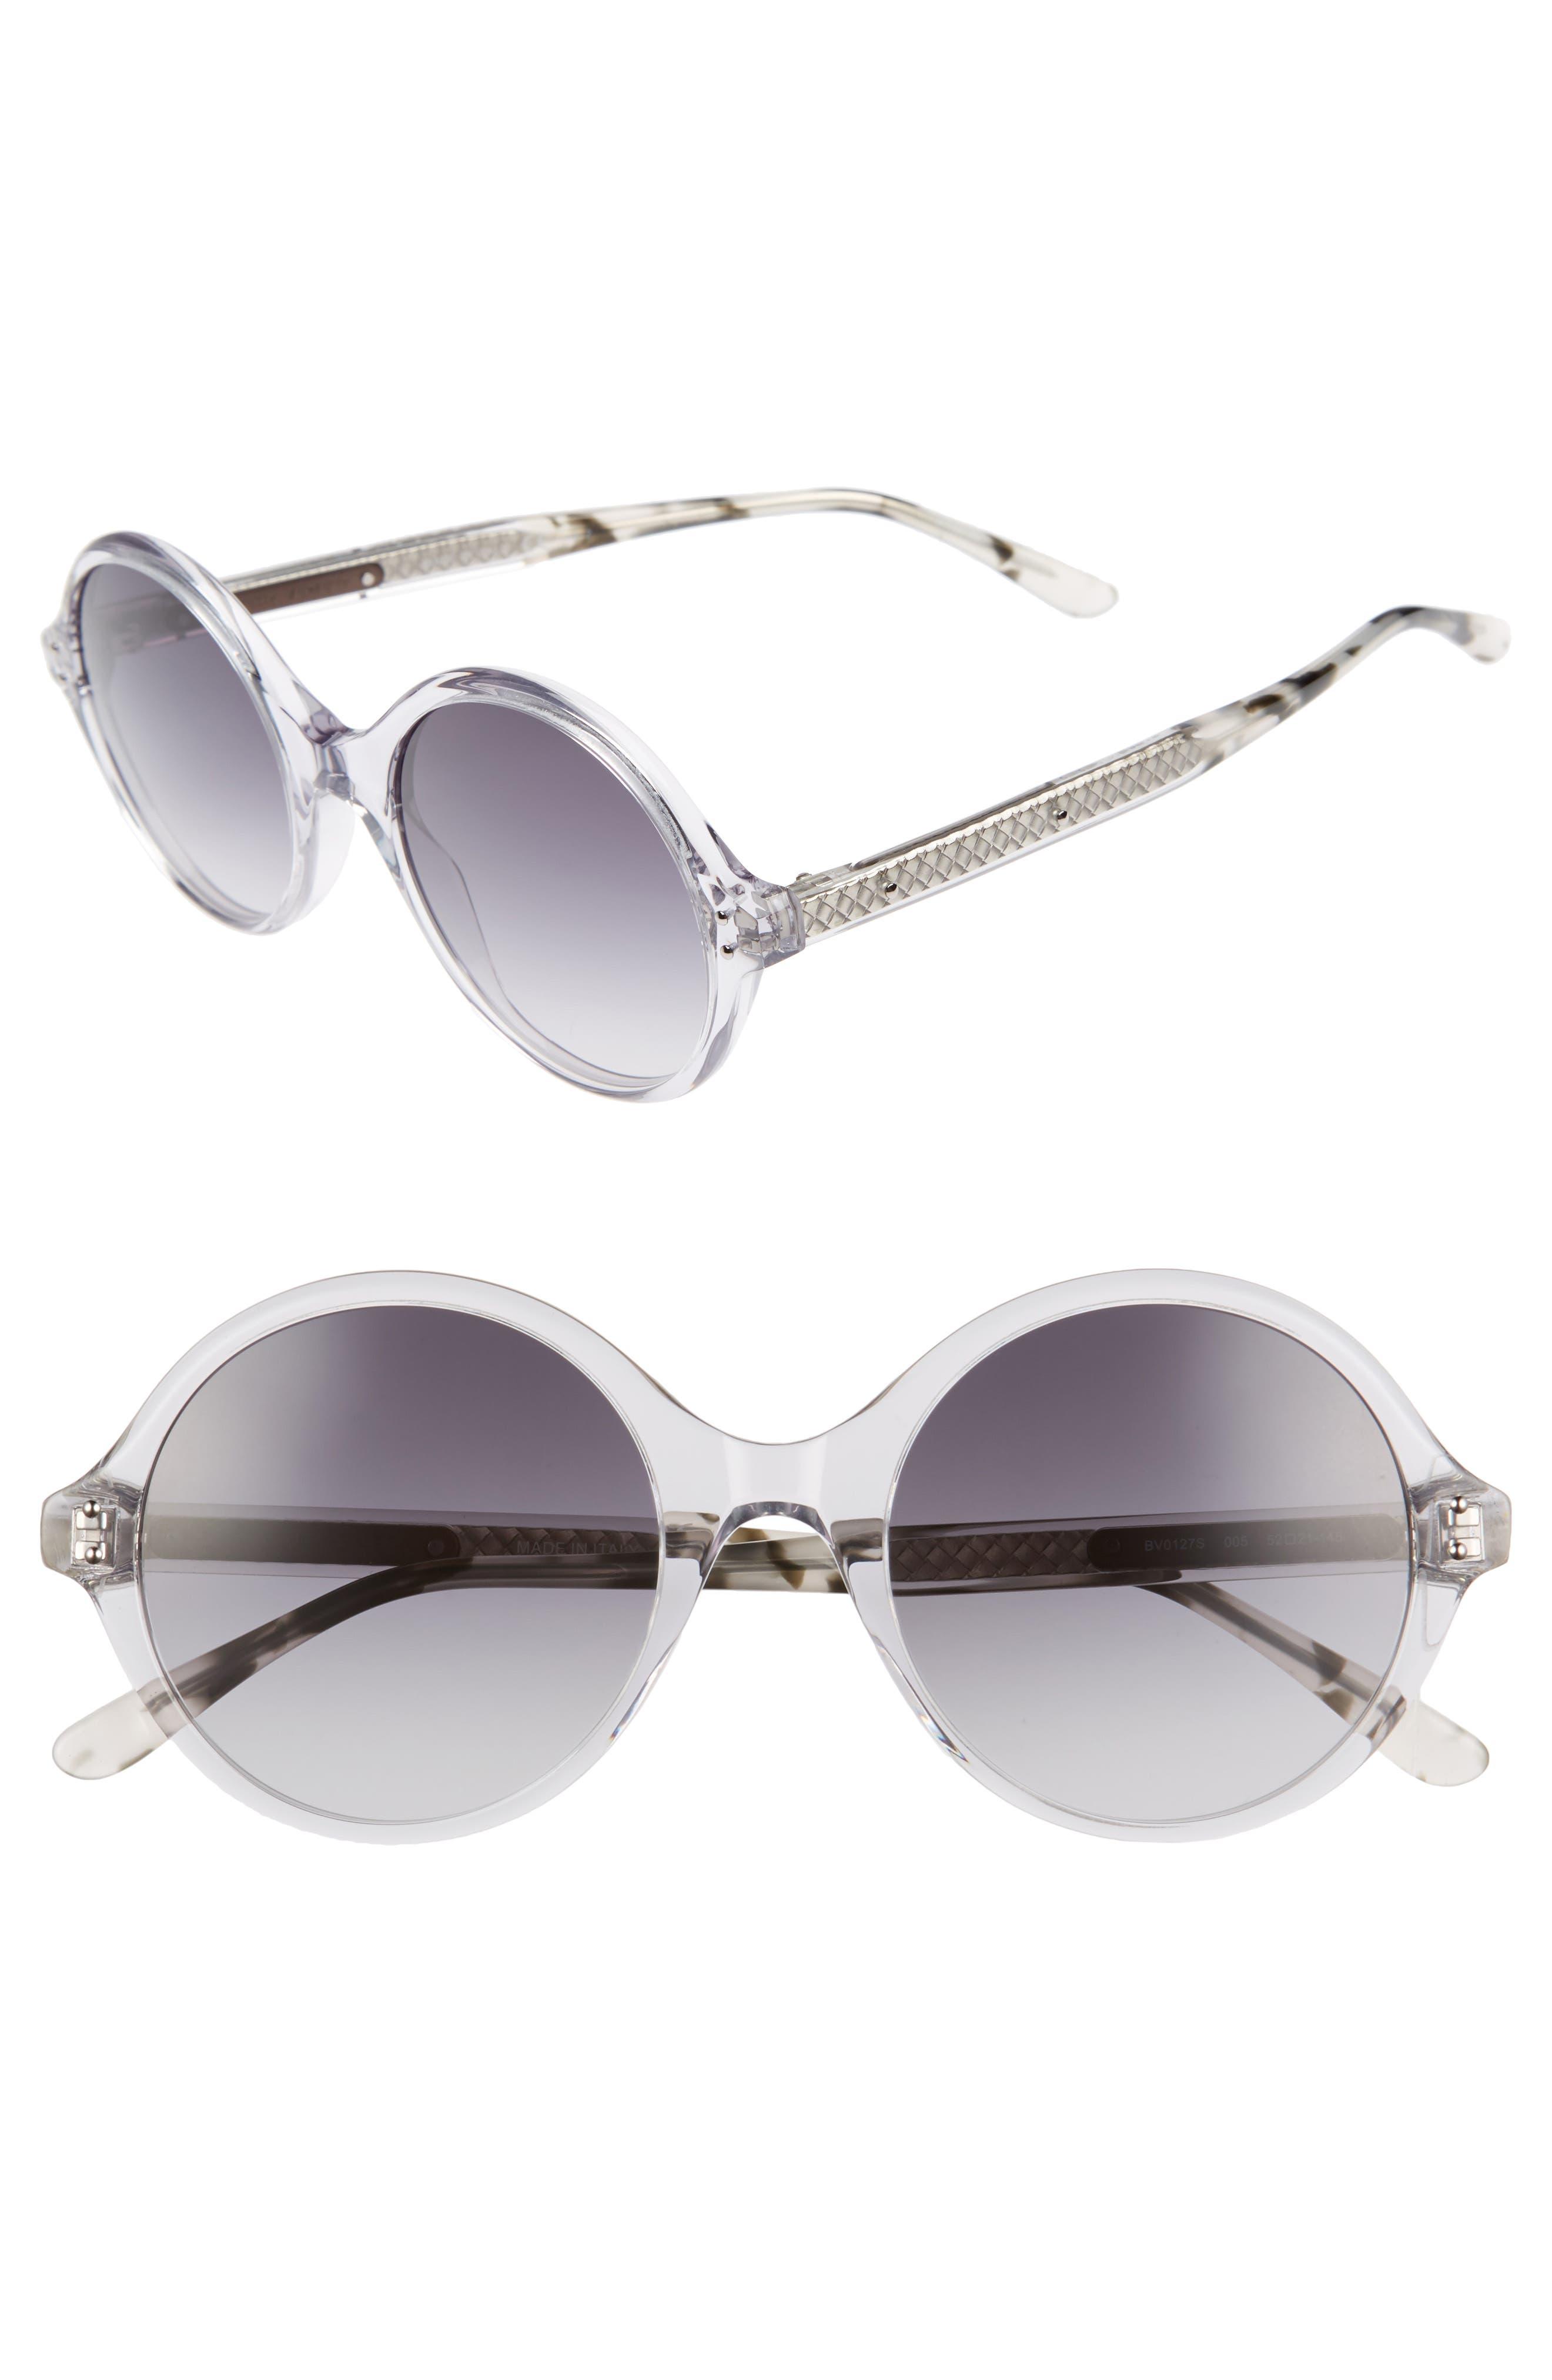 52mm Round Sunglasses,                         Main,                         color, Grey